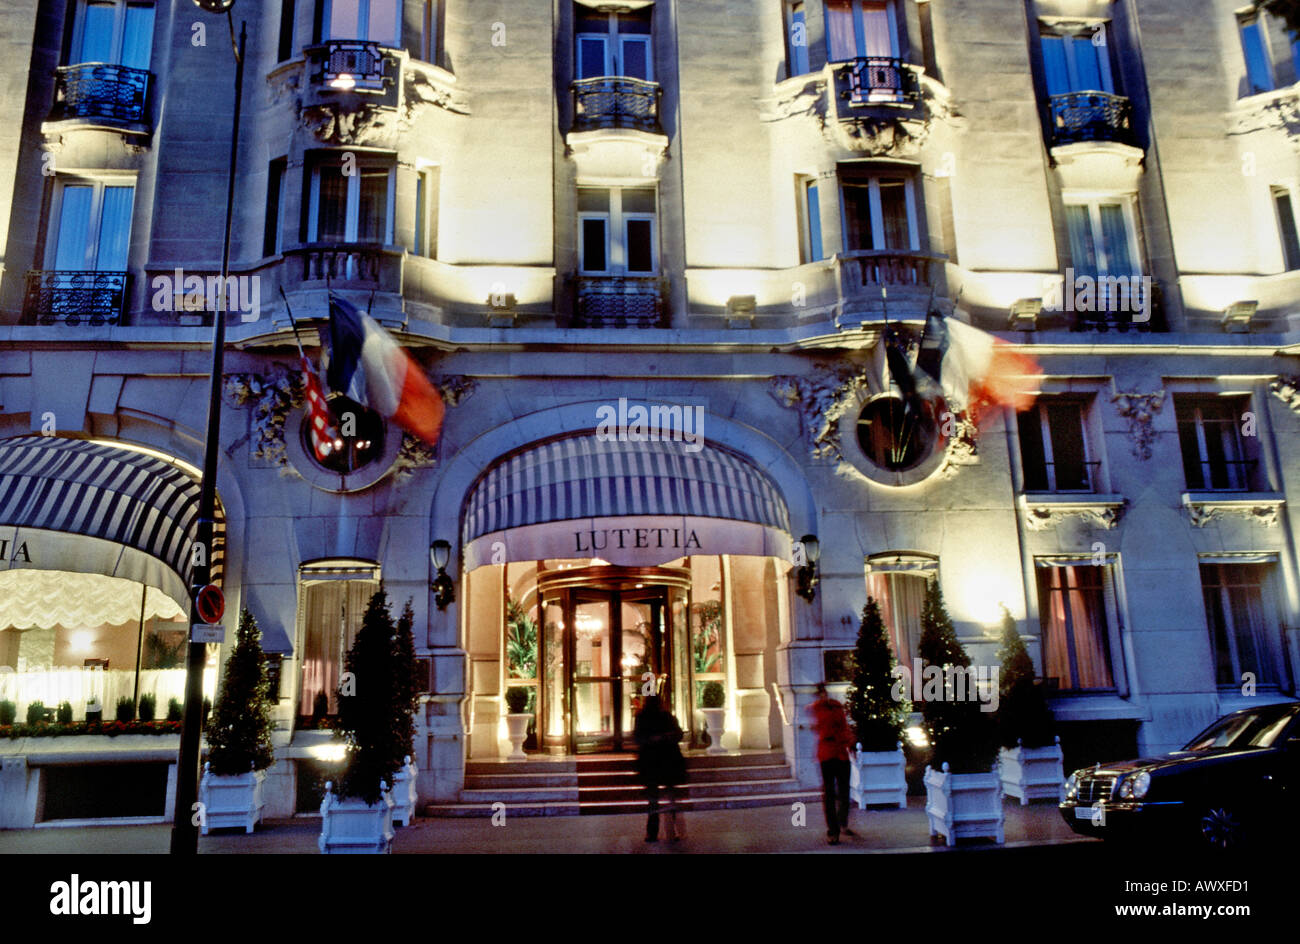 Paris France French Luxury 'Hotel Lutetia' Palace Hotel 'Art Nouveau Style' Exterior Detail Entrance - Stock Image